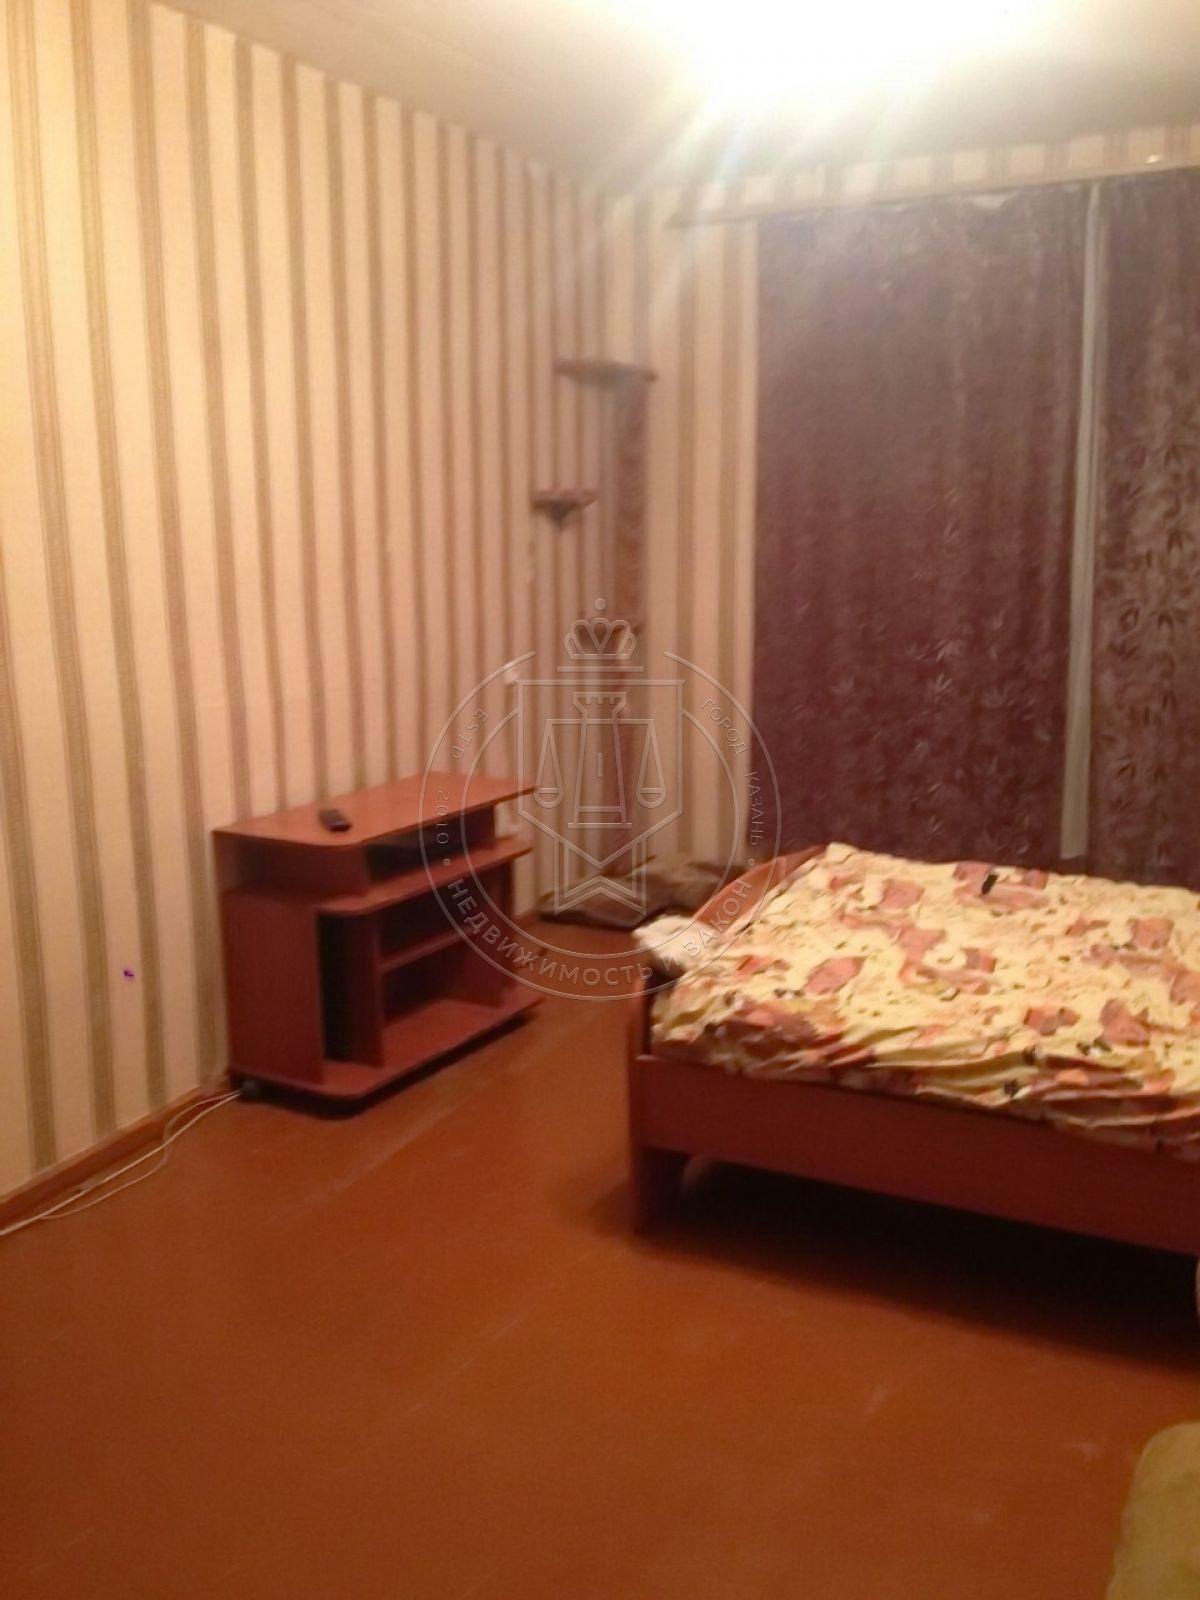 Продажа 2-к квартиры Карбышева ул, 13, 47.0 м² (миниатюра №4)